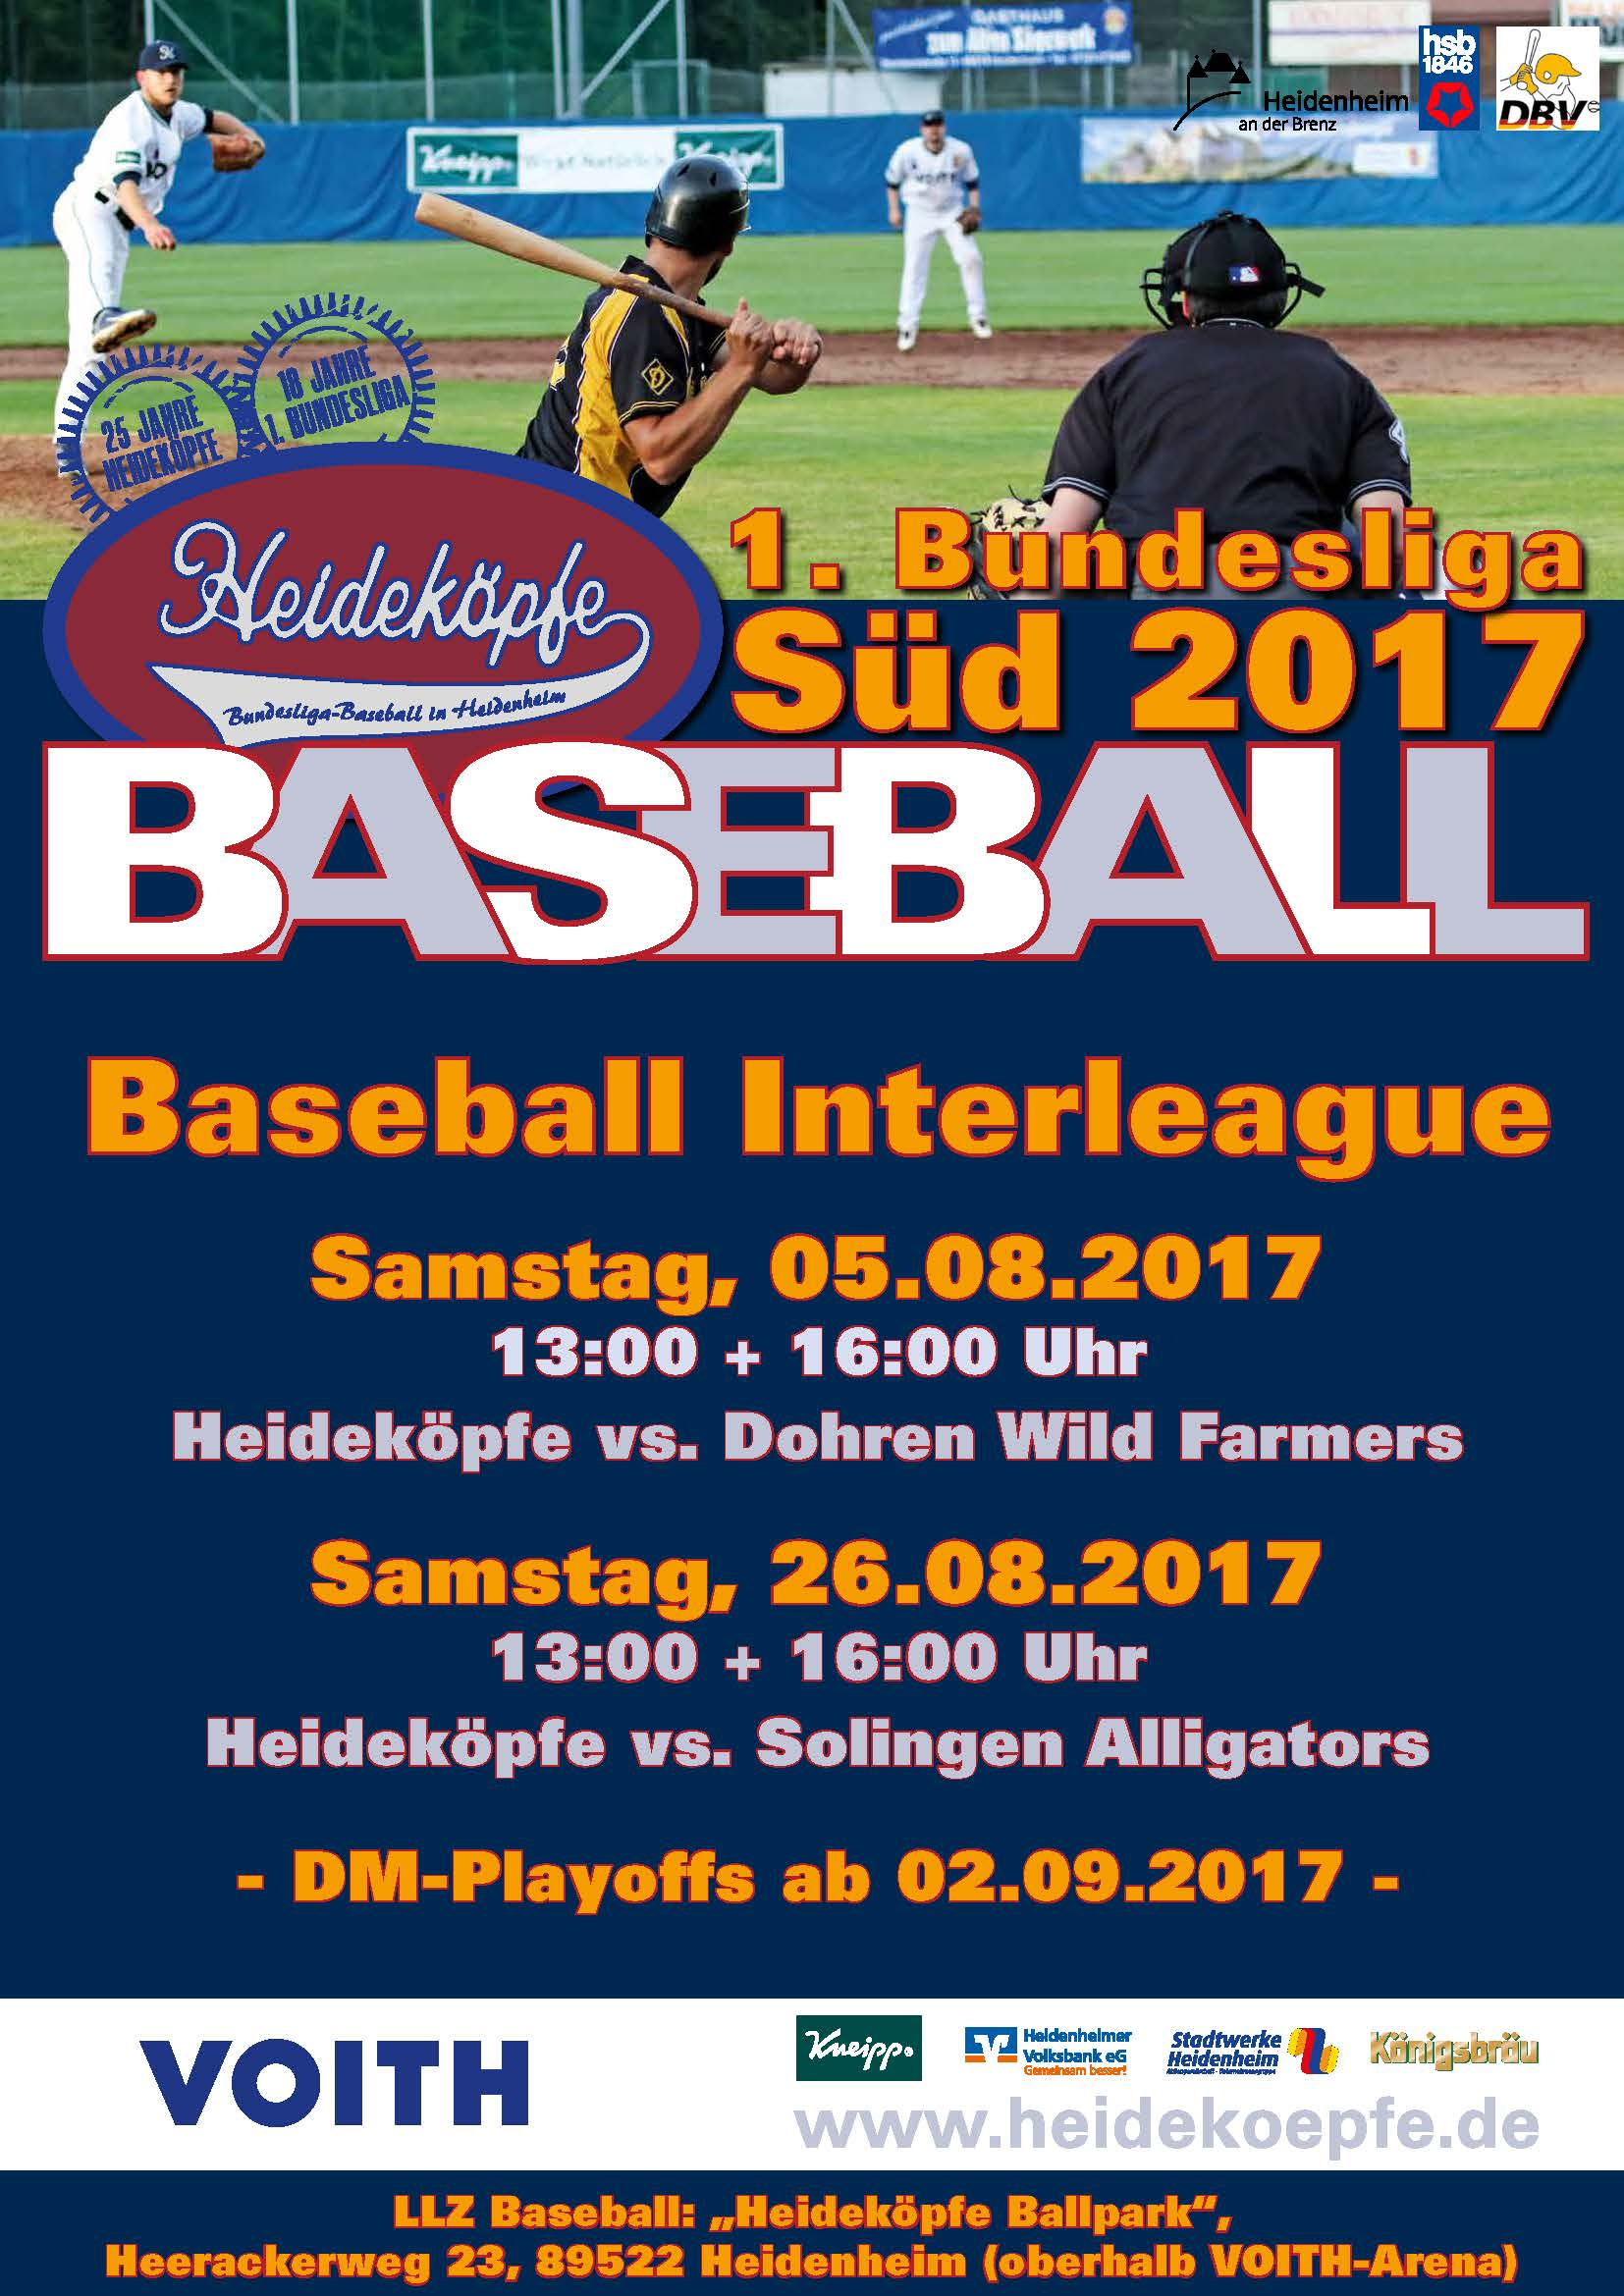 Heidekoepfe Plakat A2 Interleague 2017_koppdruck